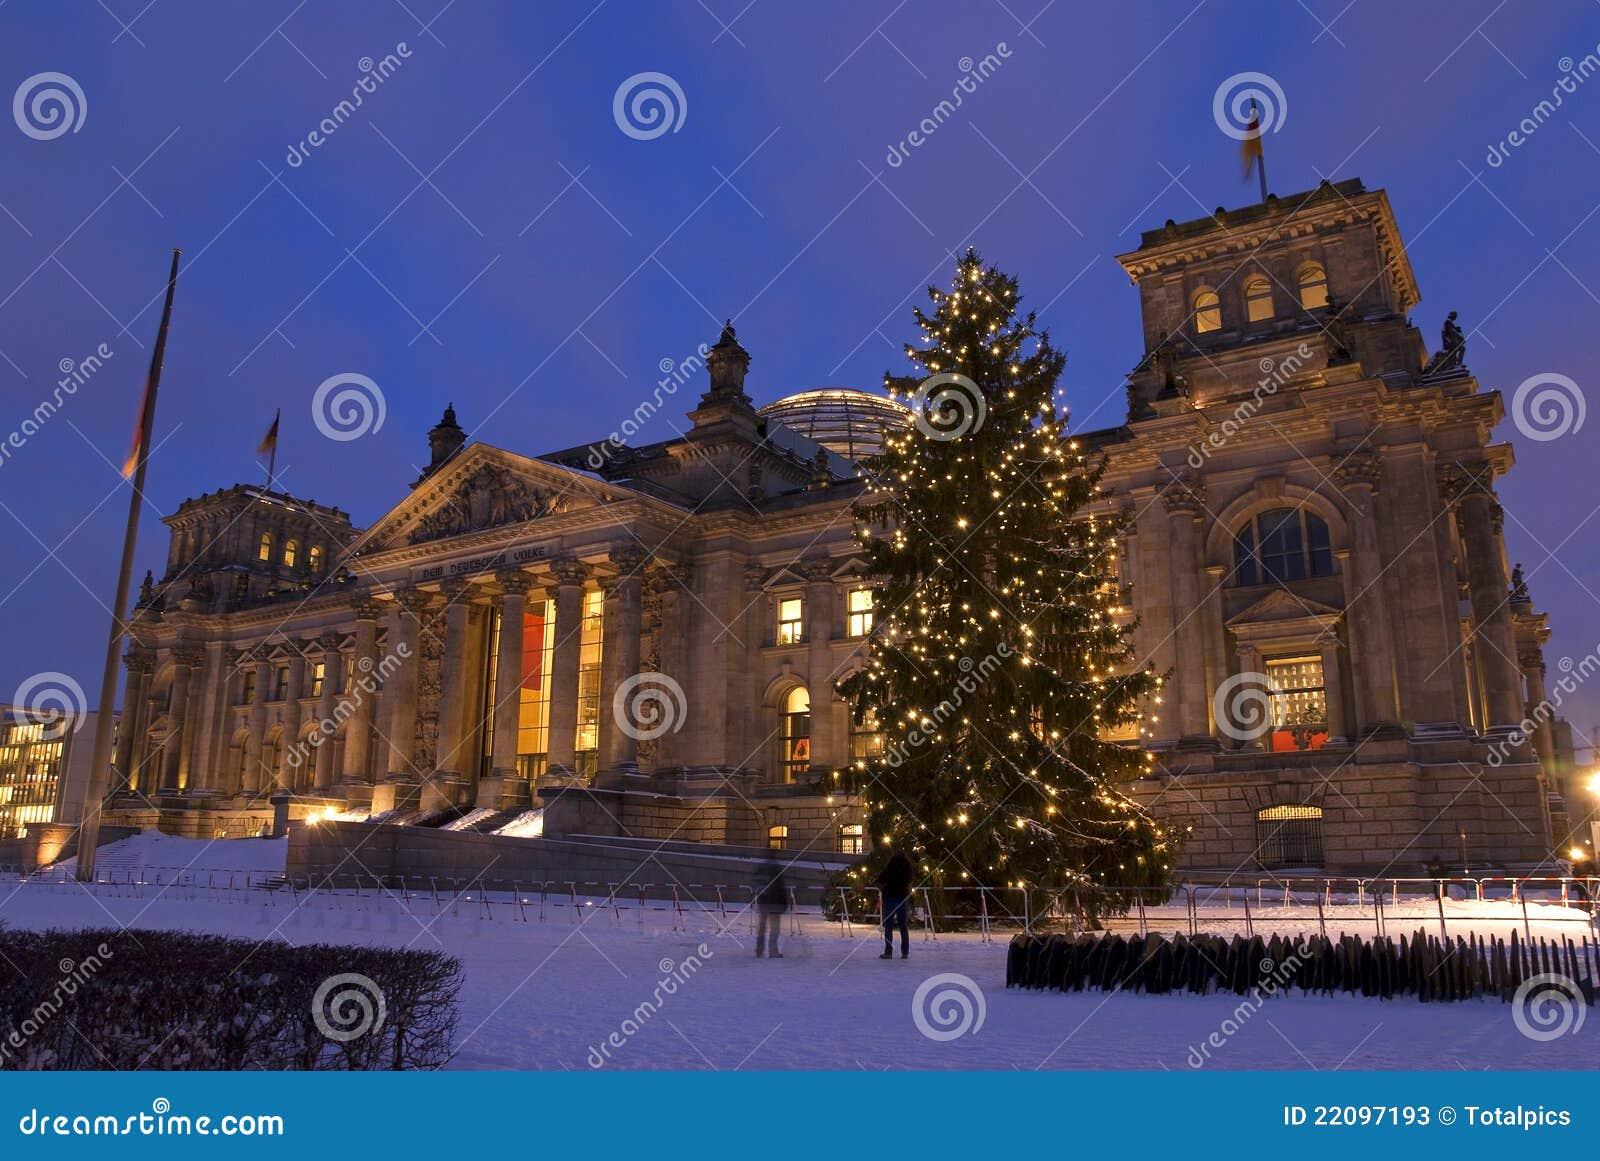 reichsatg大厦在与圣诞树的冬天和雪在柏林.图片